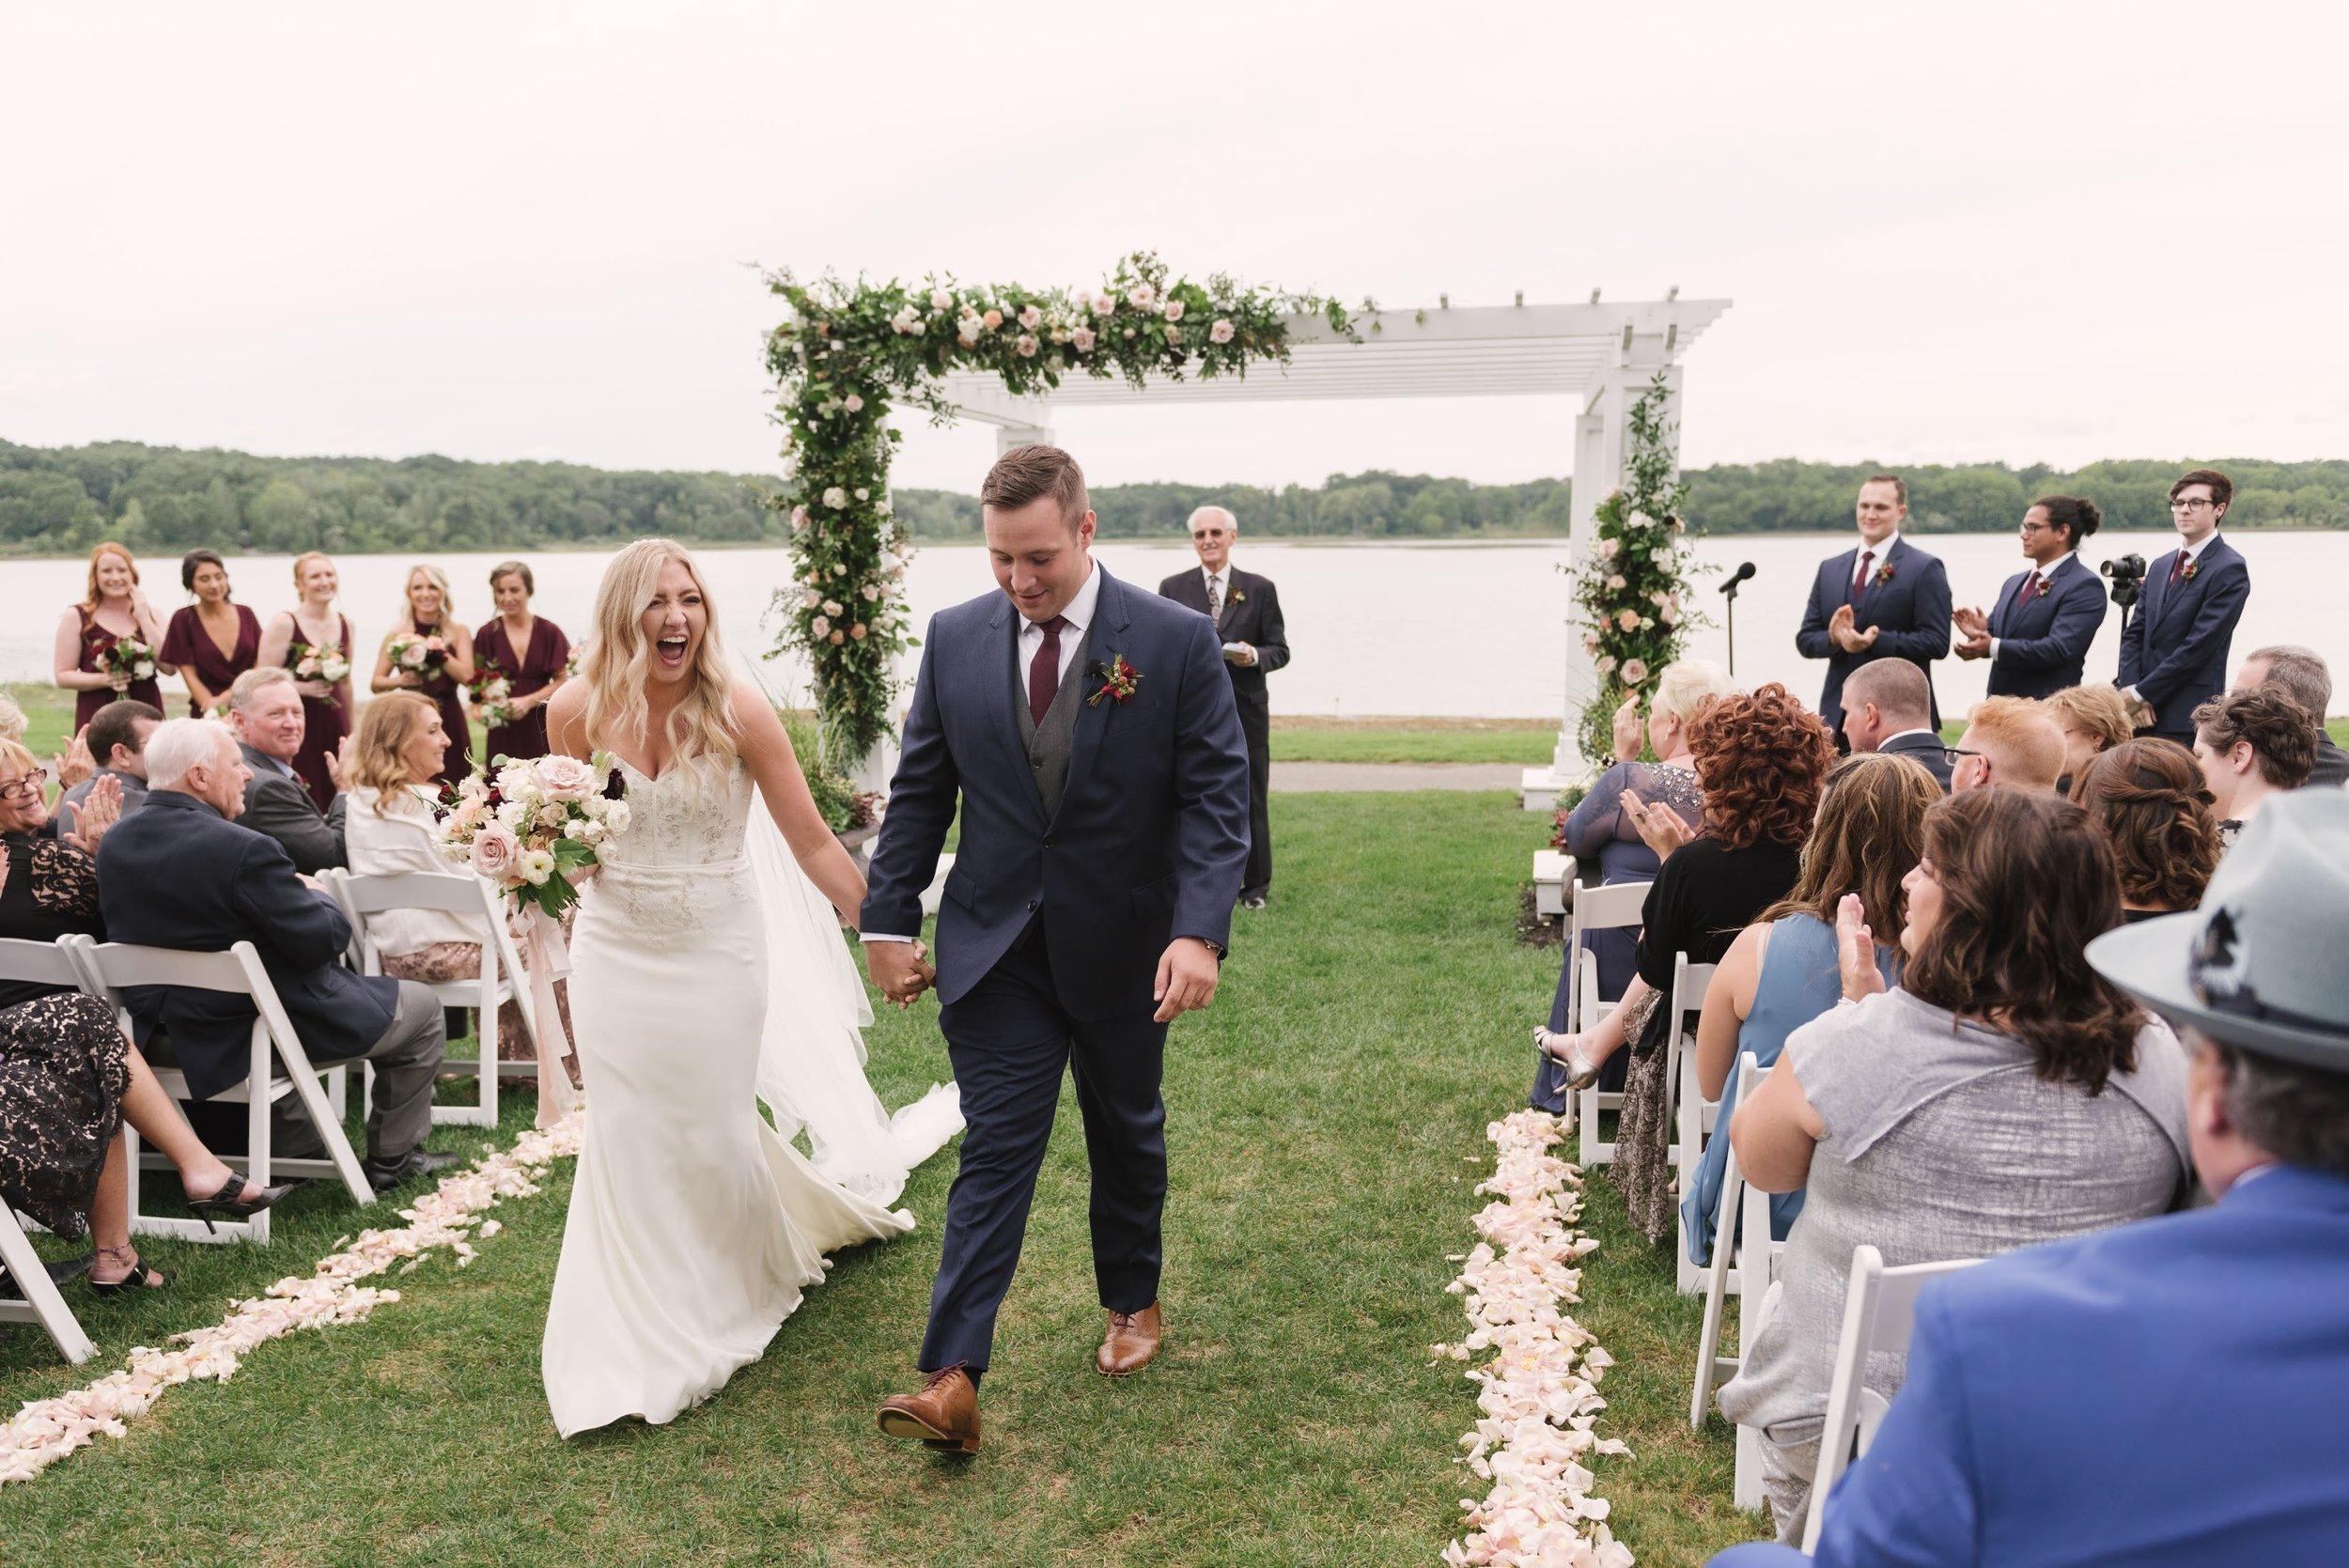 Field-Gems-Photography-Detroit-Michigan-Wedding-Photographer-Family-Photographer-Photobooth-090818-723.jpg